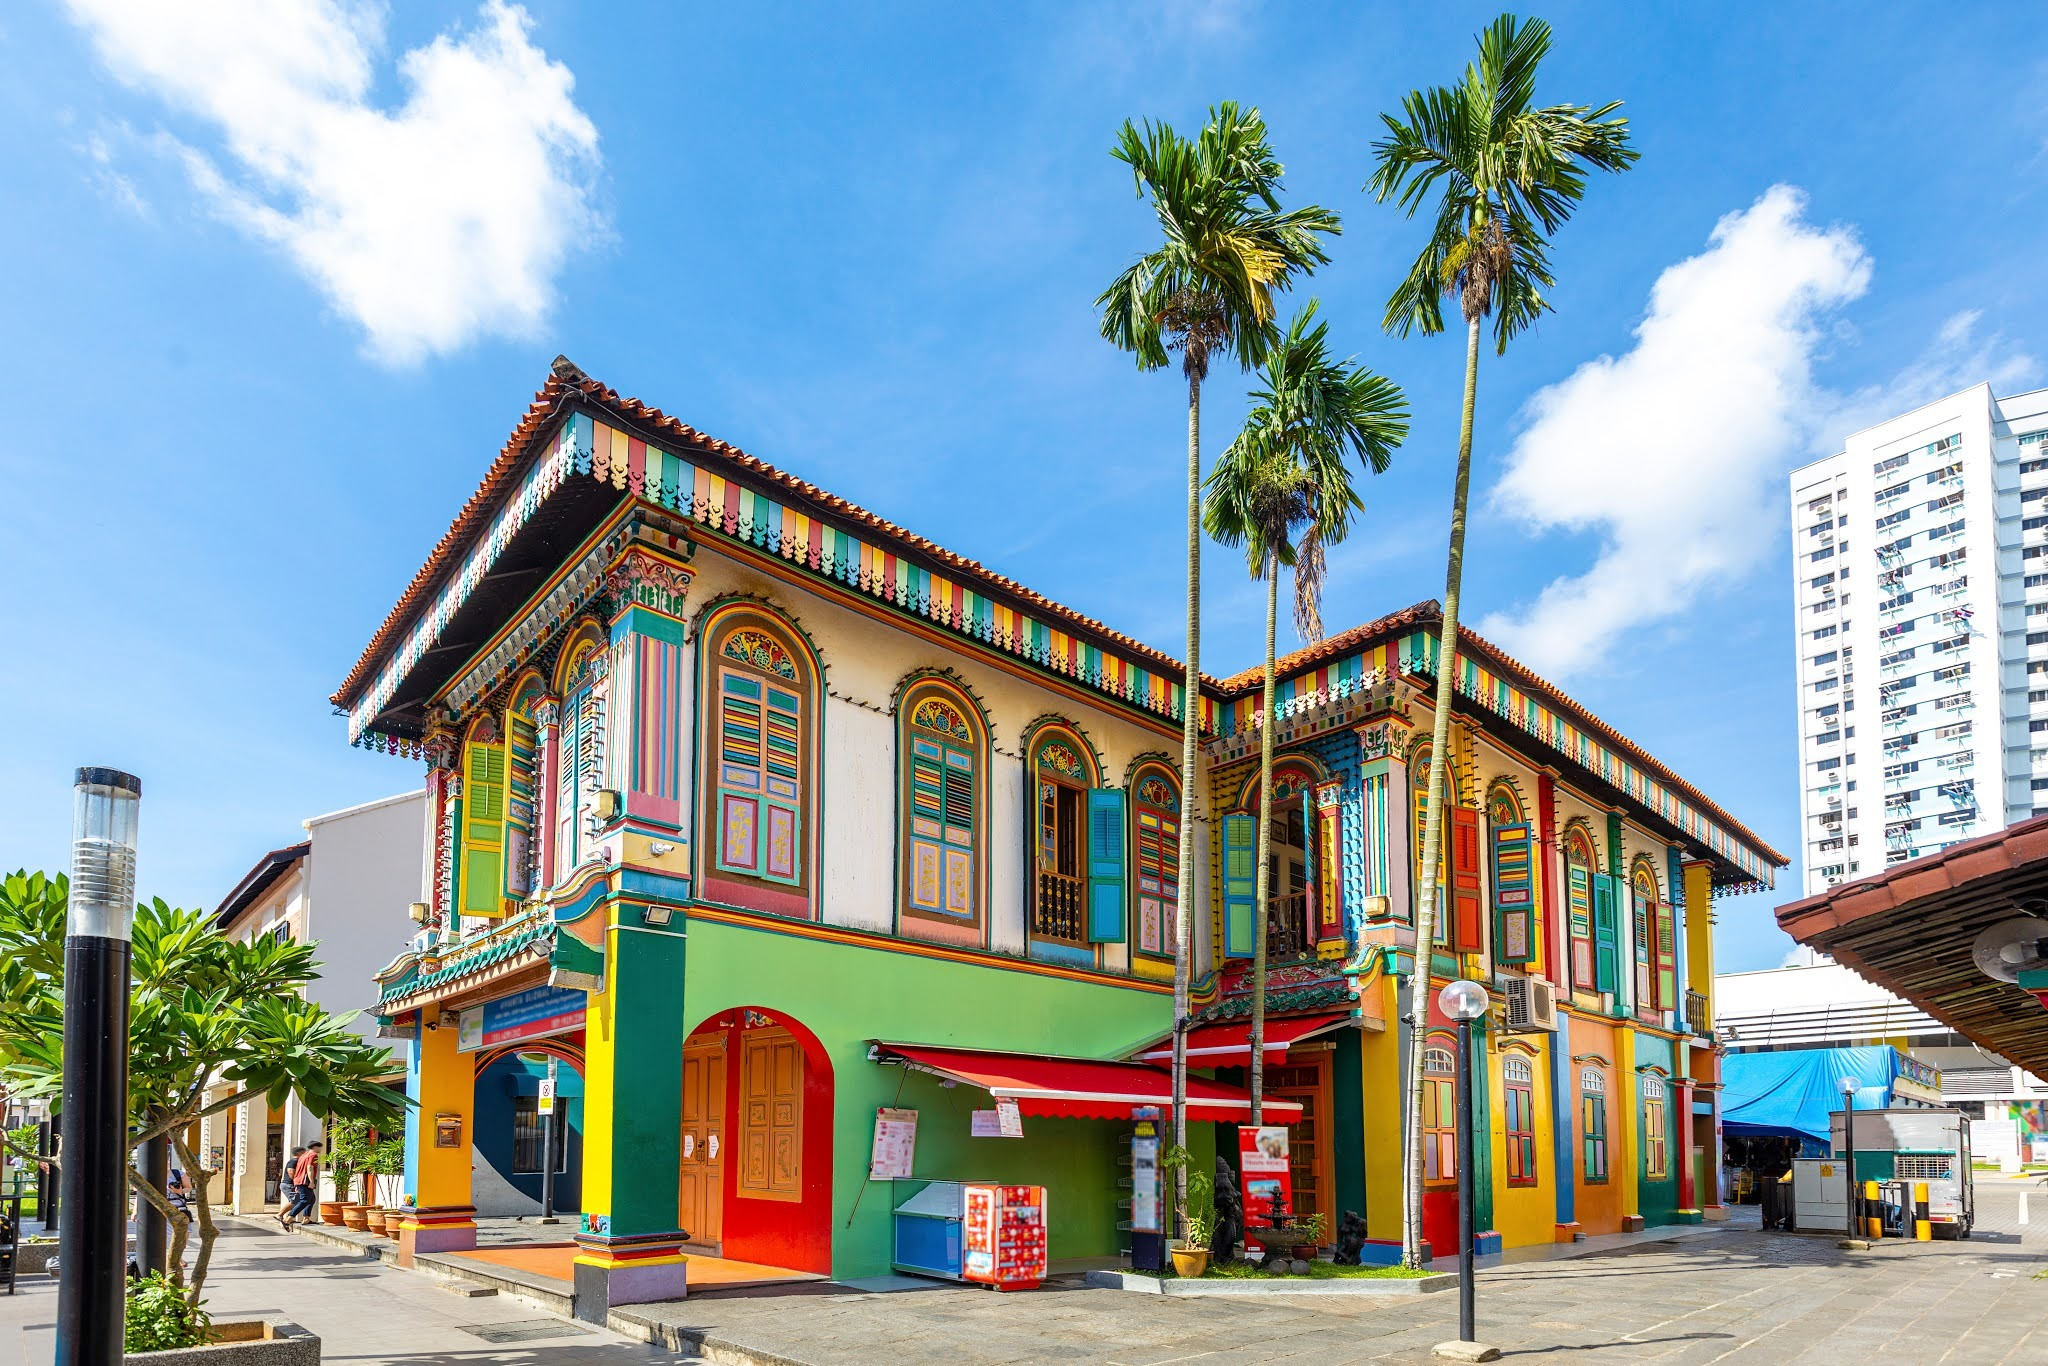 Tan Teng Niah House in Little India